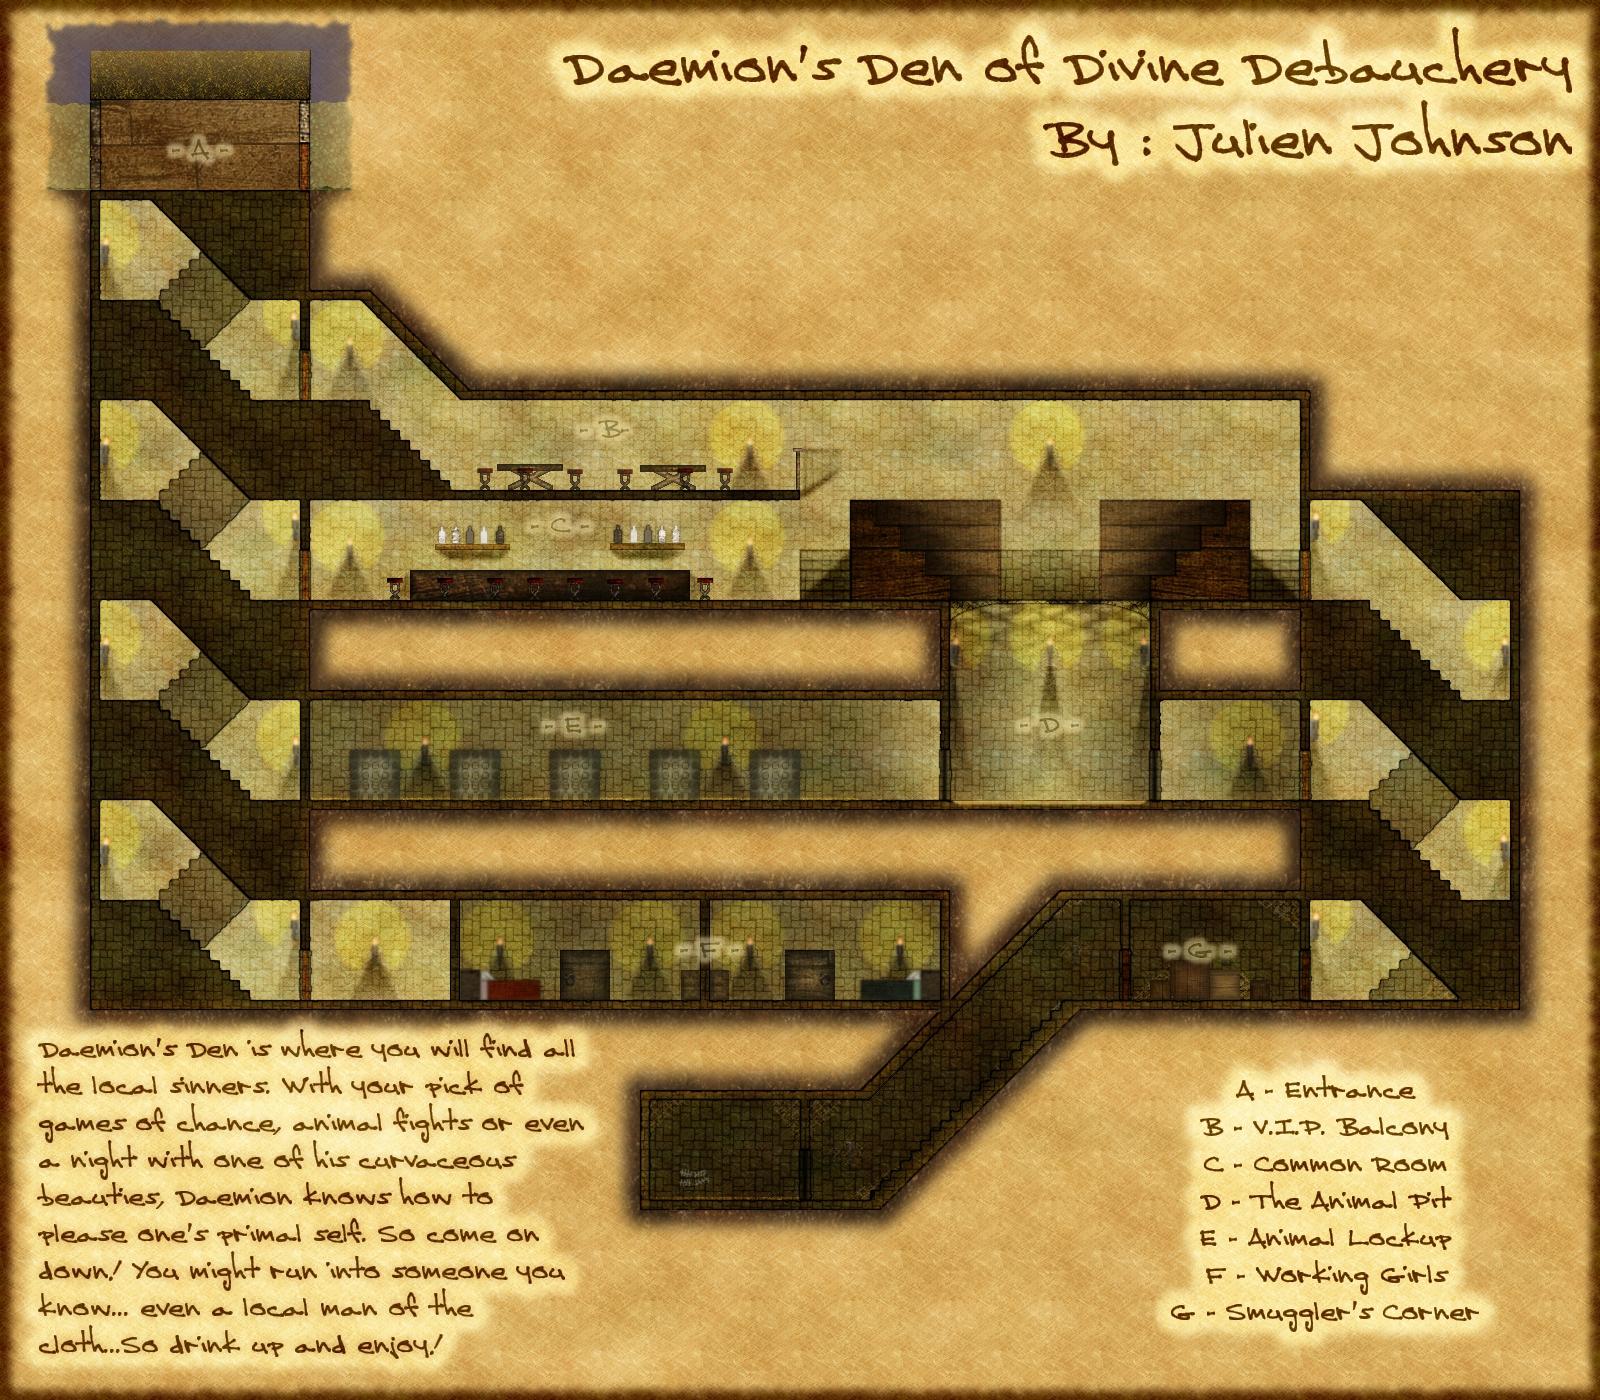 Daemion's Den of Divine Debauchery